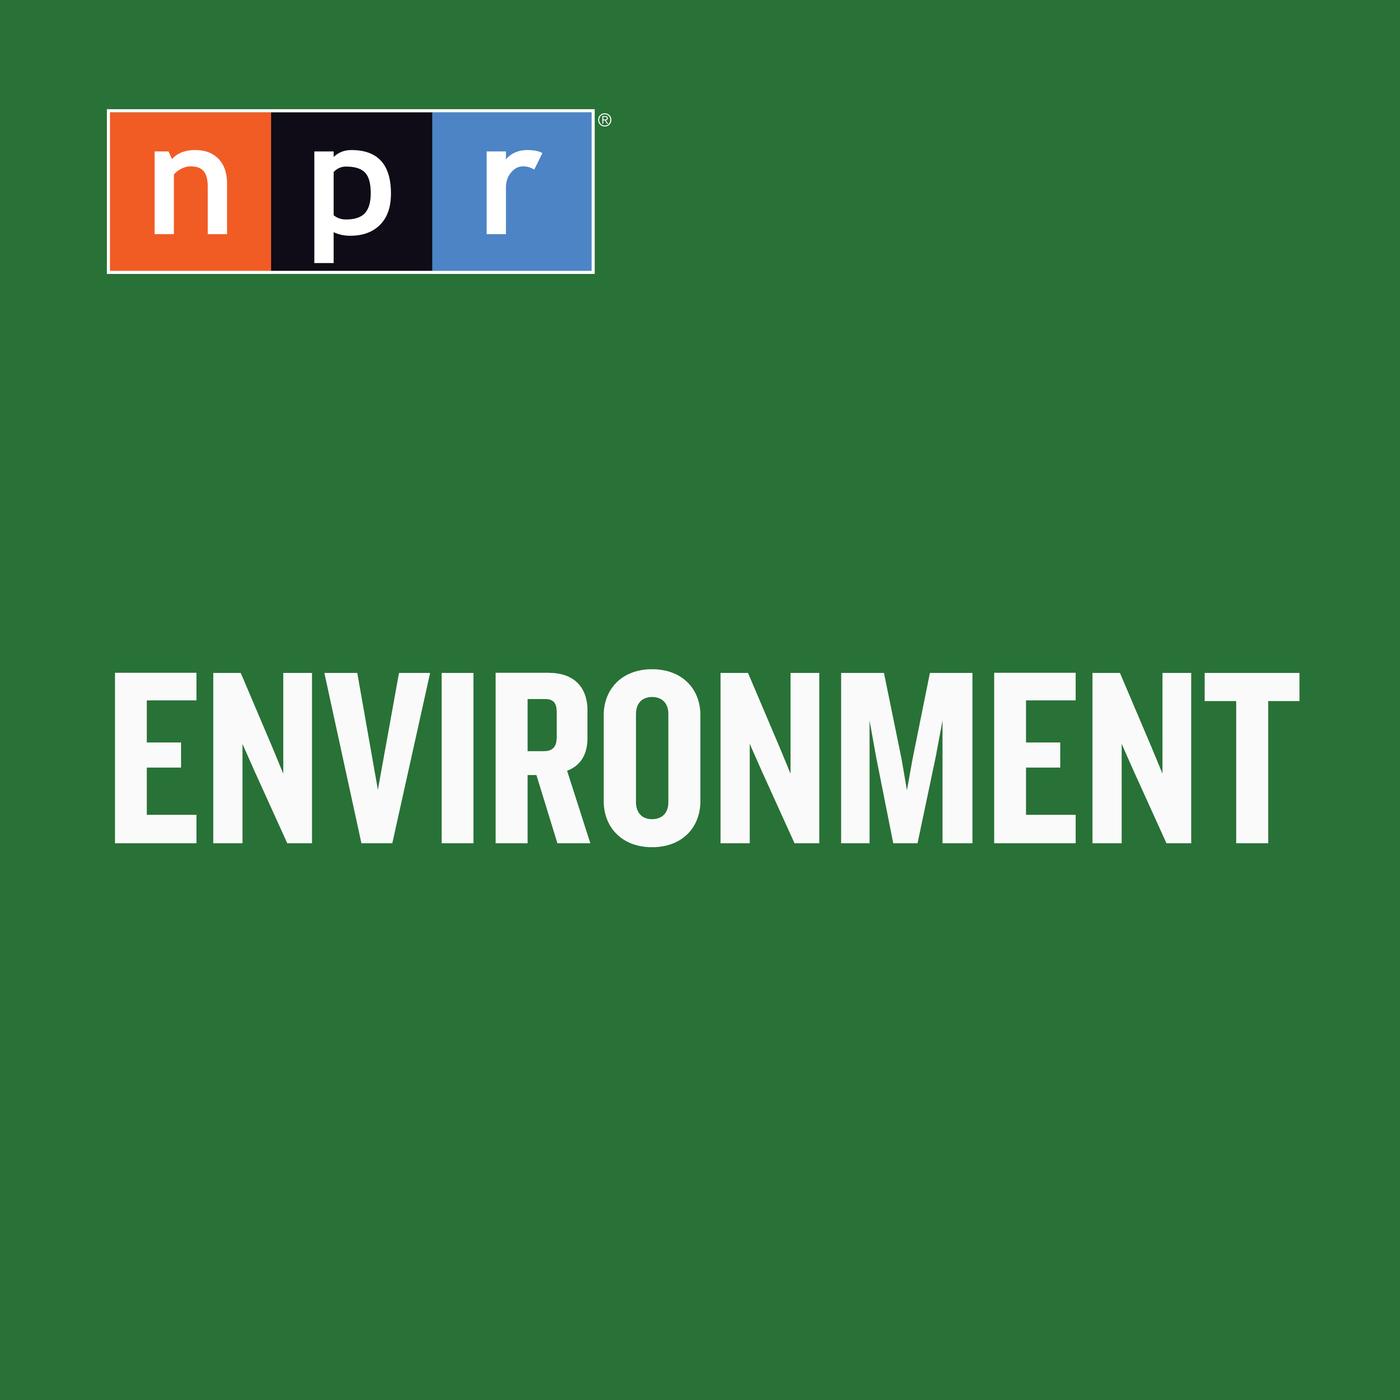 Environment : NPR:NPR